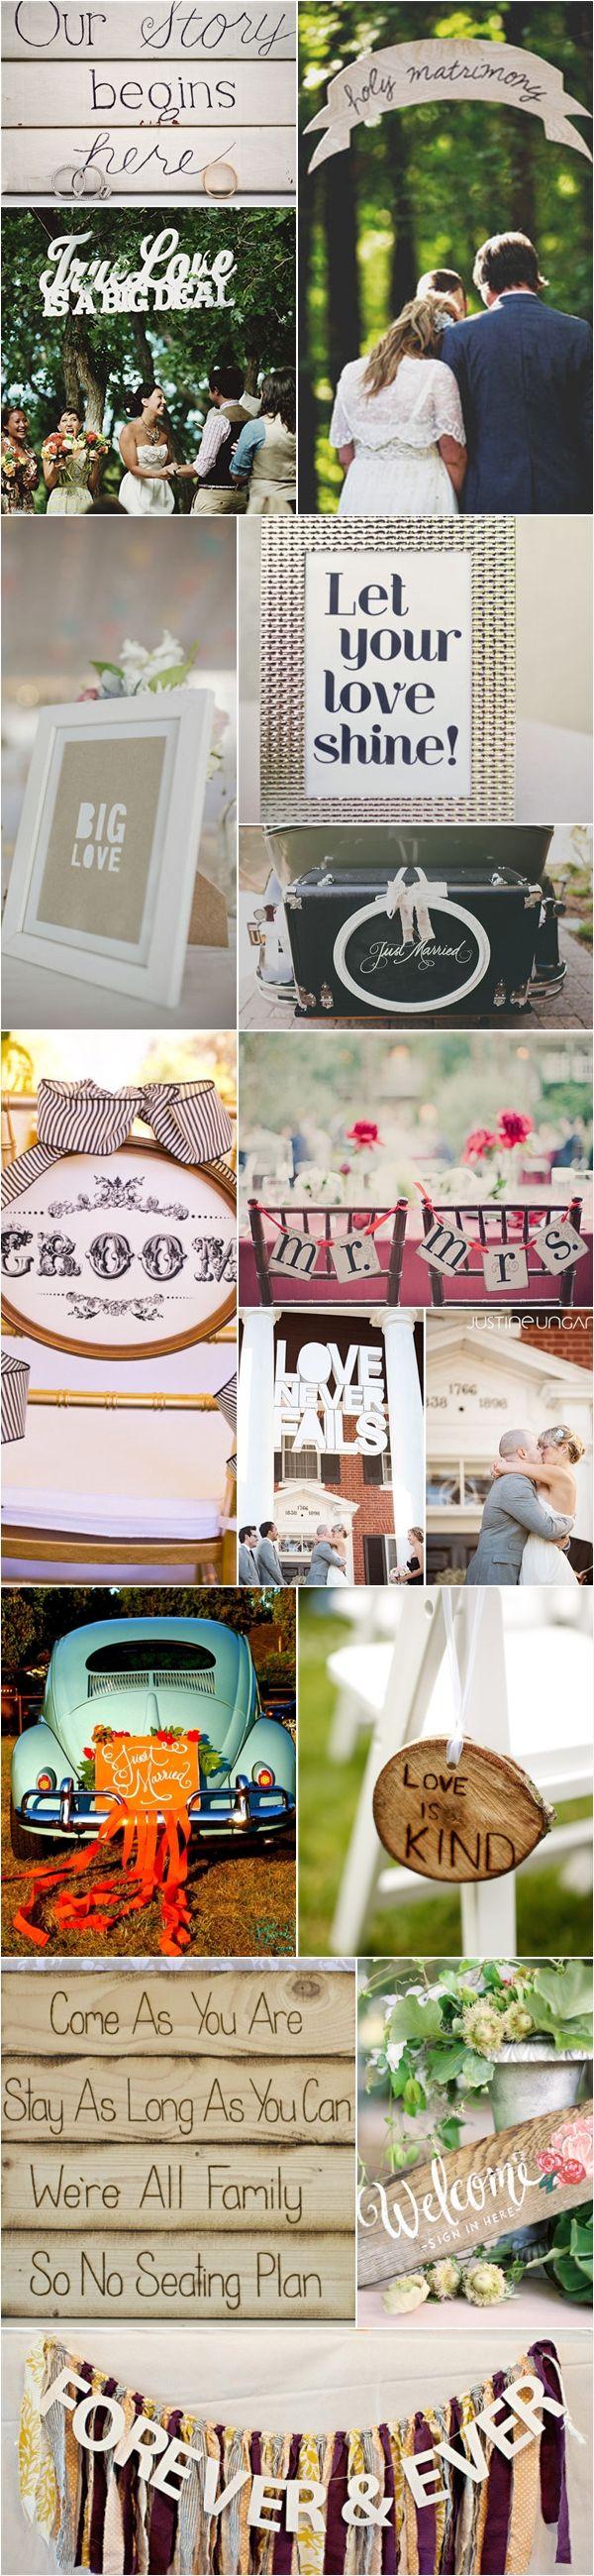 Praise Wedding » Wedding Inspiration and Planning » 57 Fun Wedding Signs